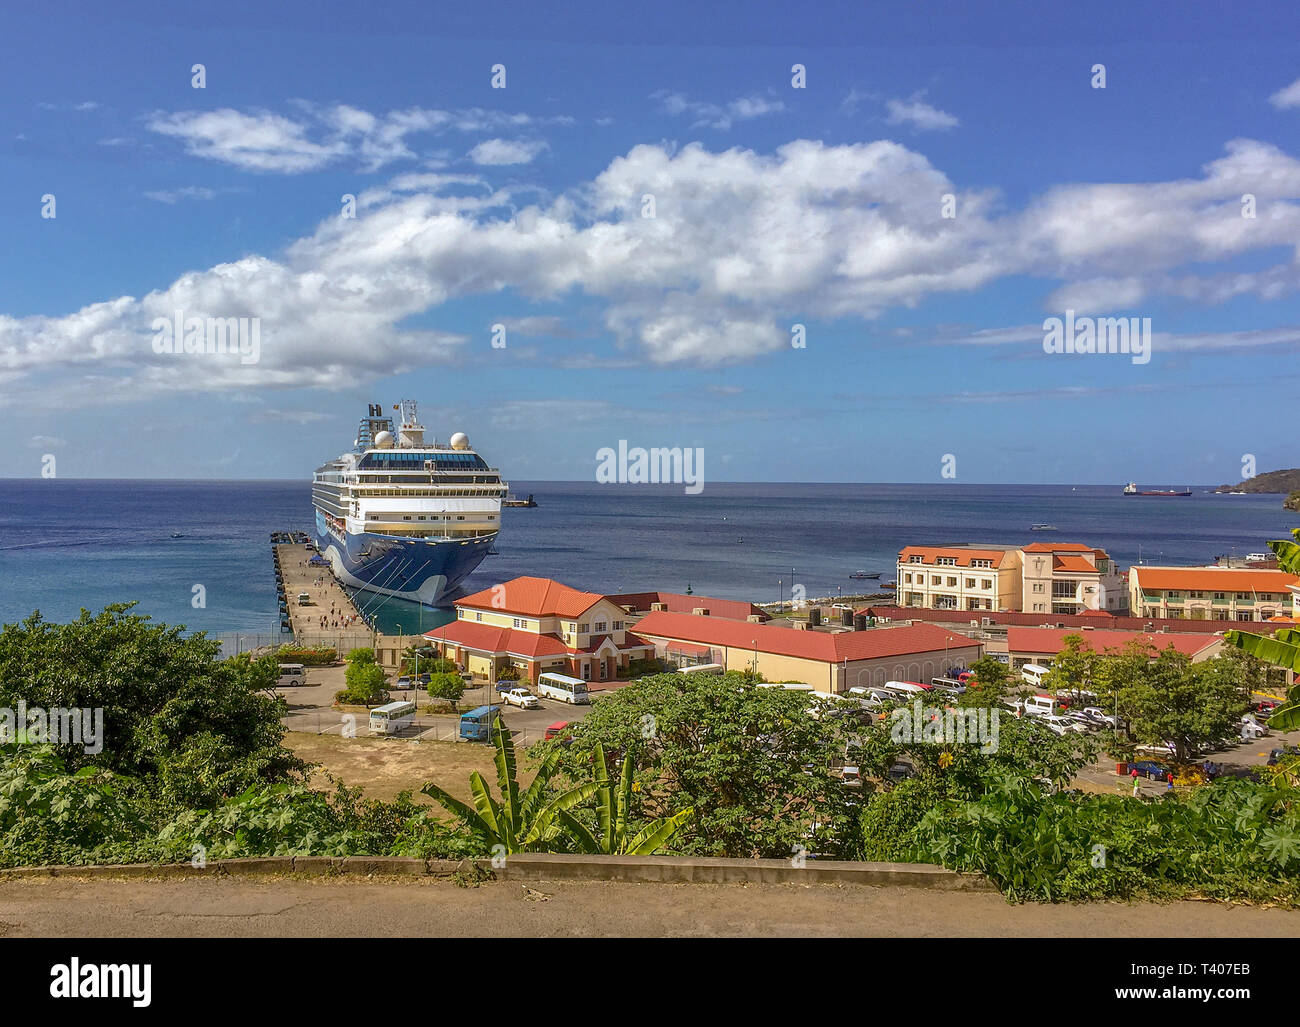 Grenada Port. St. George's, Grenada. Kreuzfahrtschiff Marella Explorer. Stockbild